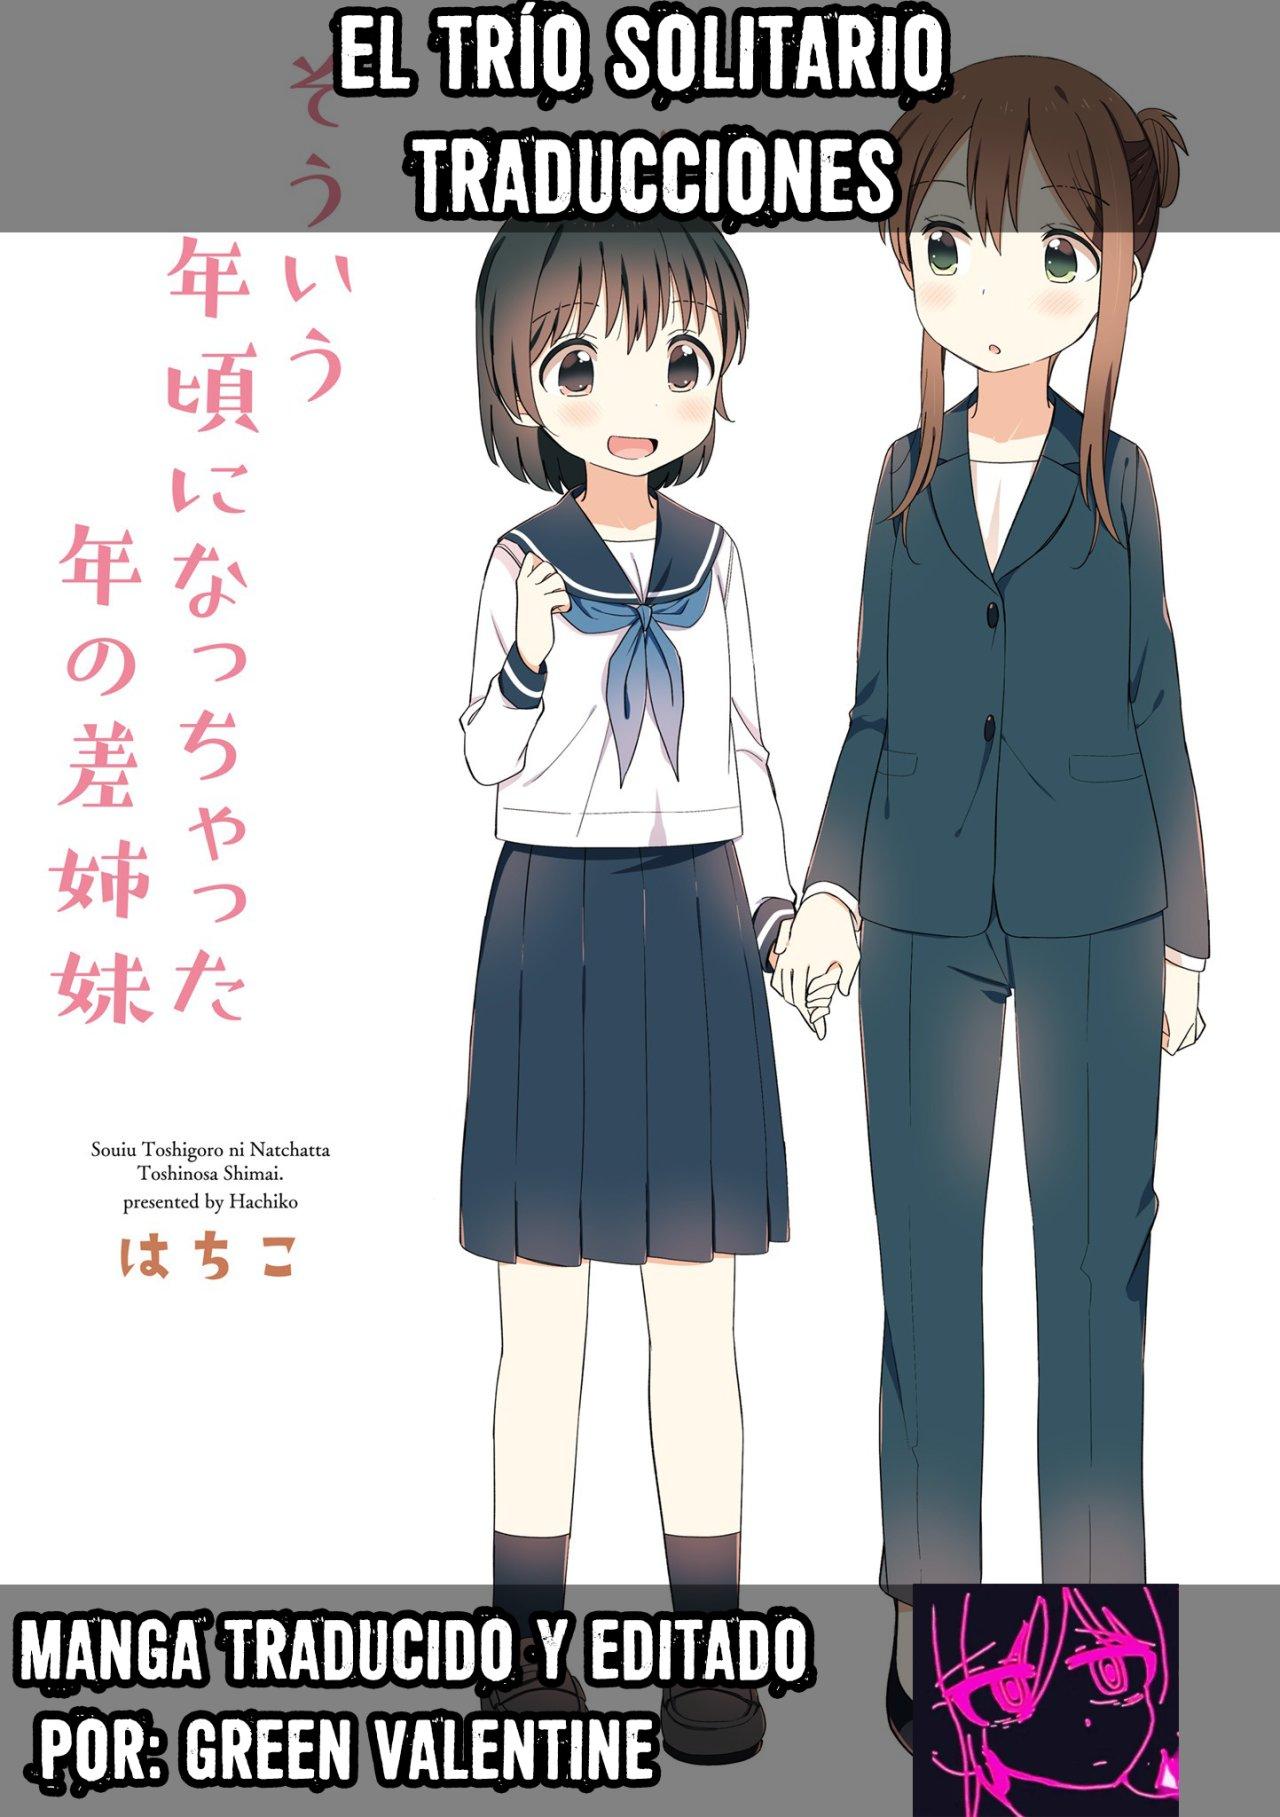 https://nine.mangadogs.com/es_manga/pic8/10/36682/946856/e887f79dc28f0a7f0c4b4d6a9e42f48b.jpg Page 1